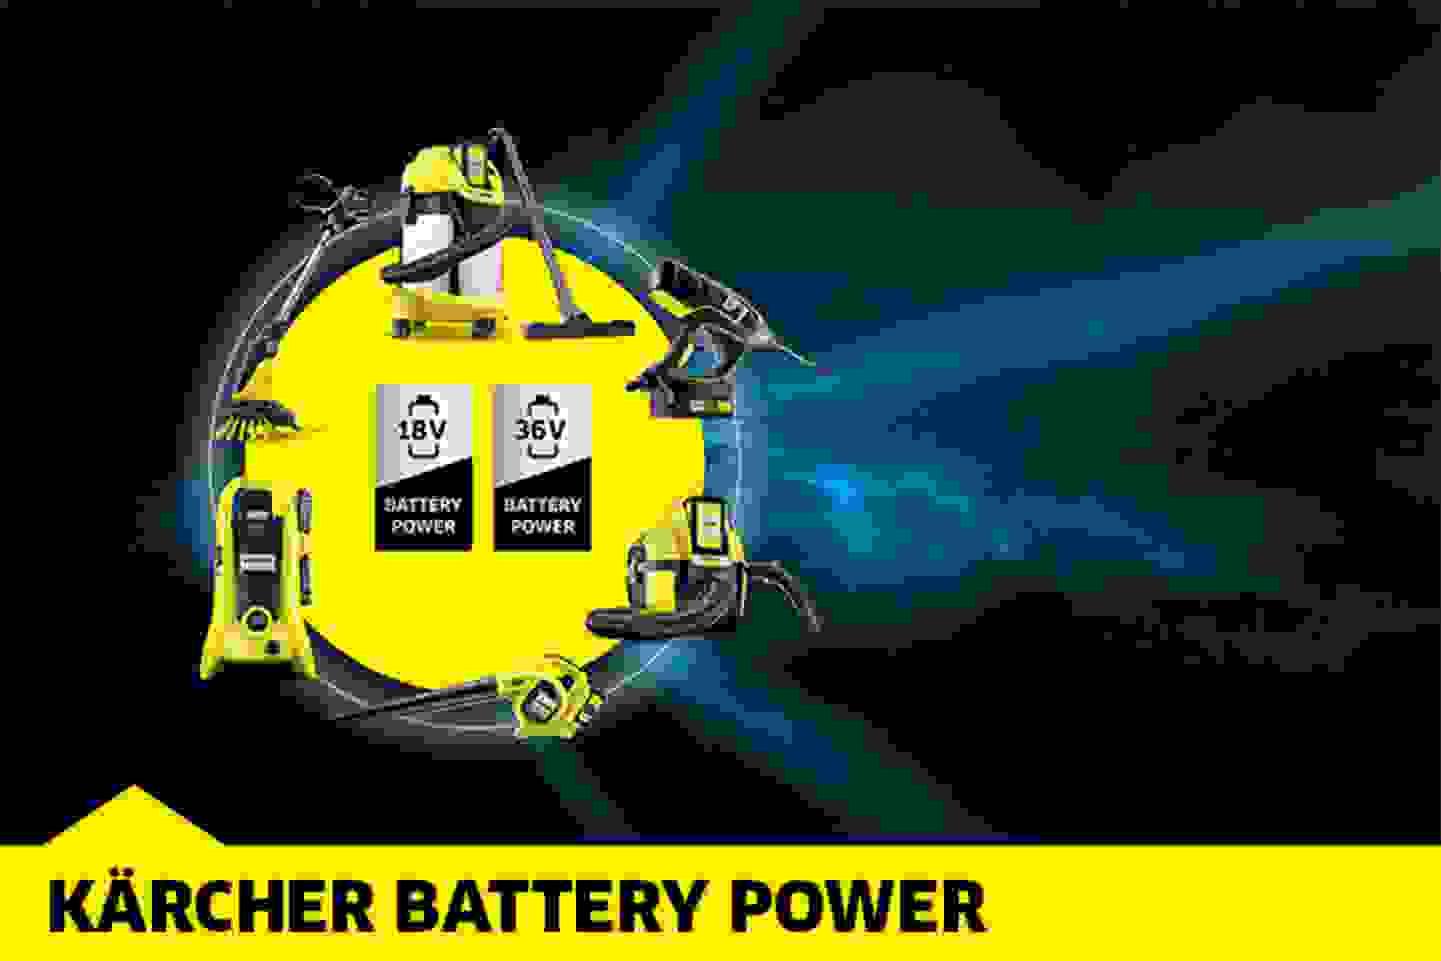 Kärcher Battery Power